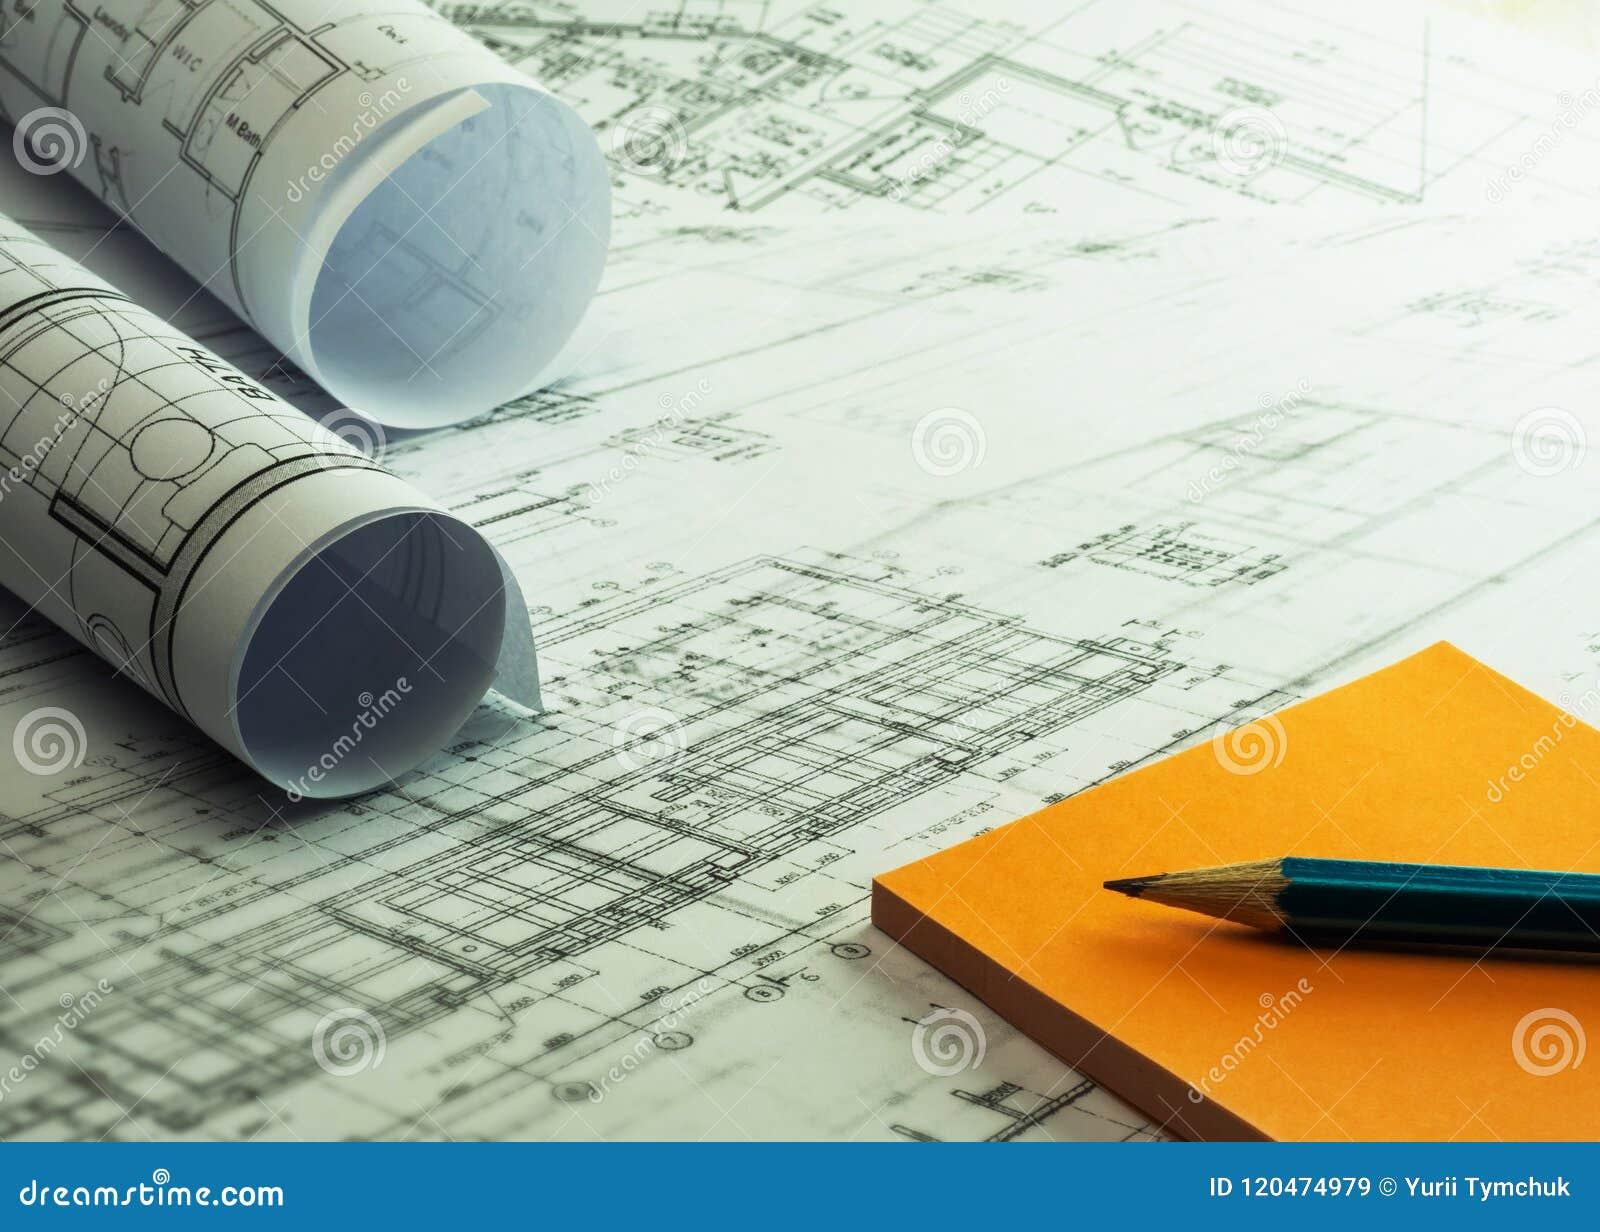 Architectenbroodjes en plannen met oranje kleverig nota s en potlood A